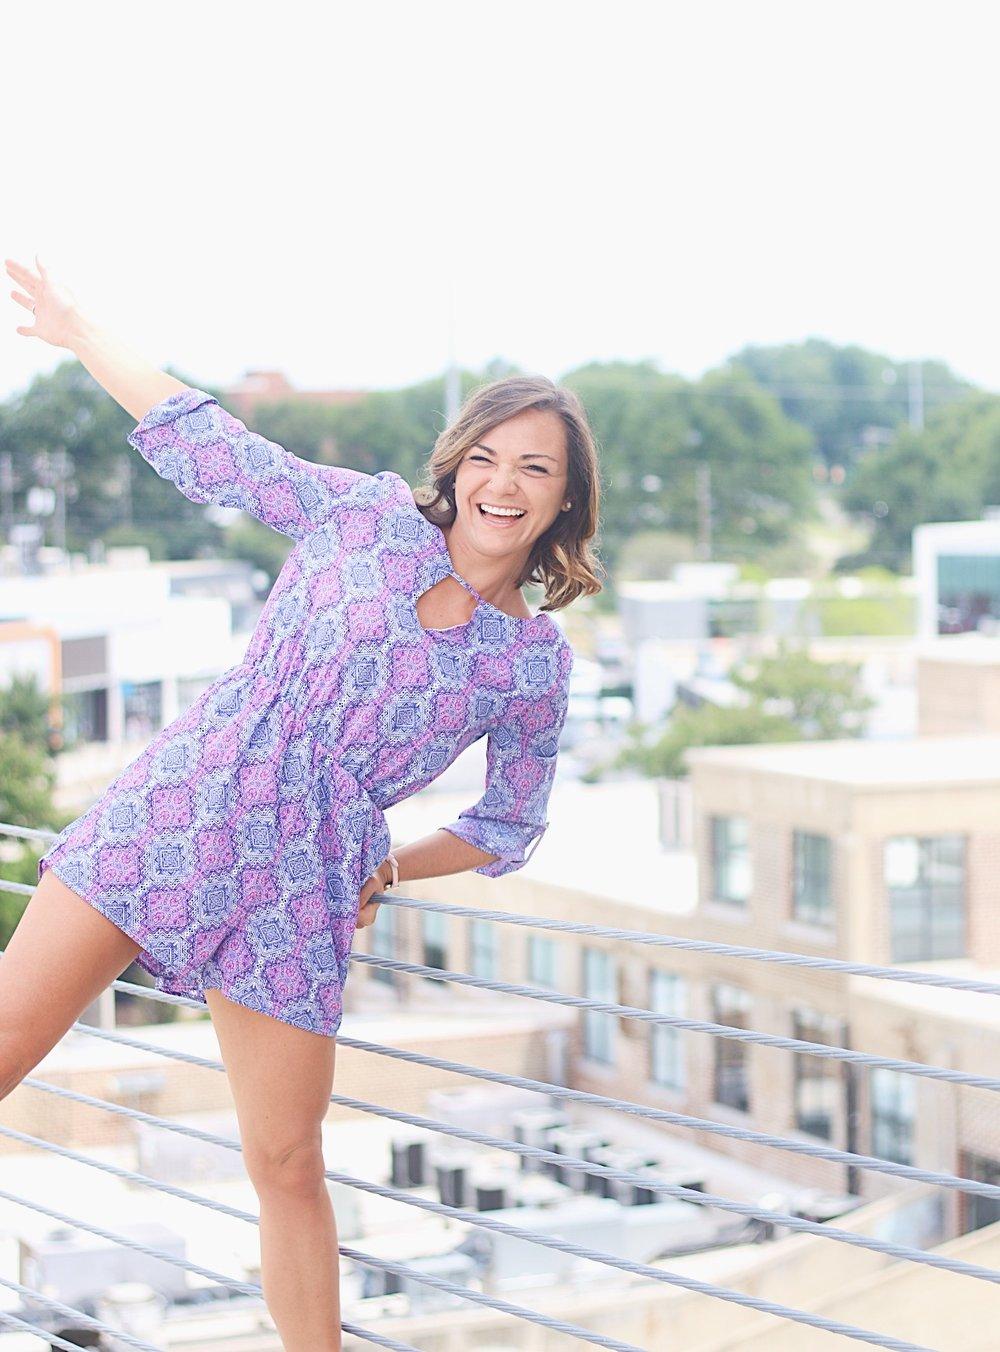 Meet Kellie,nutritional coach behind @healthandkellness_